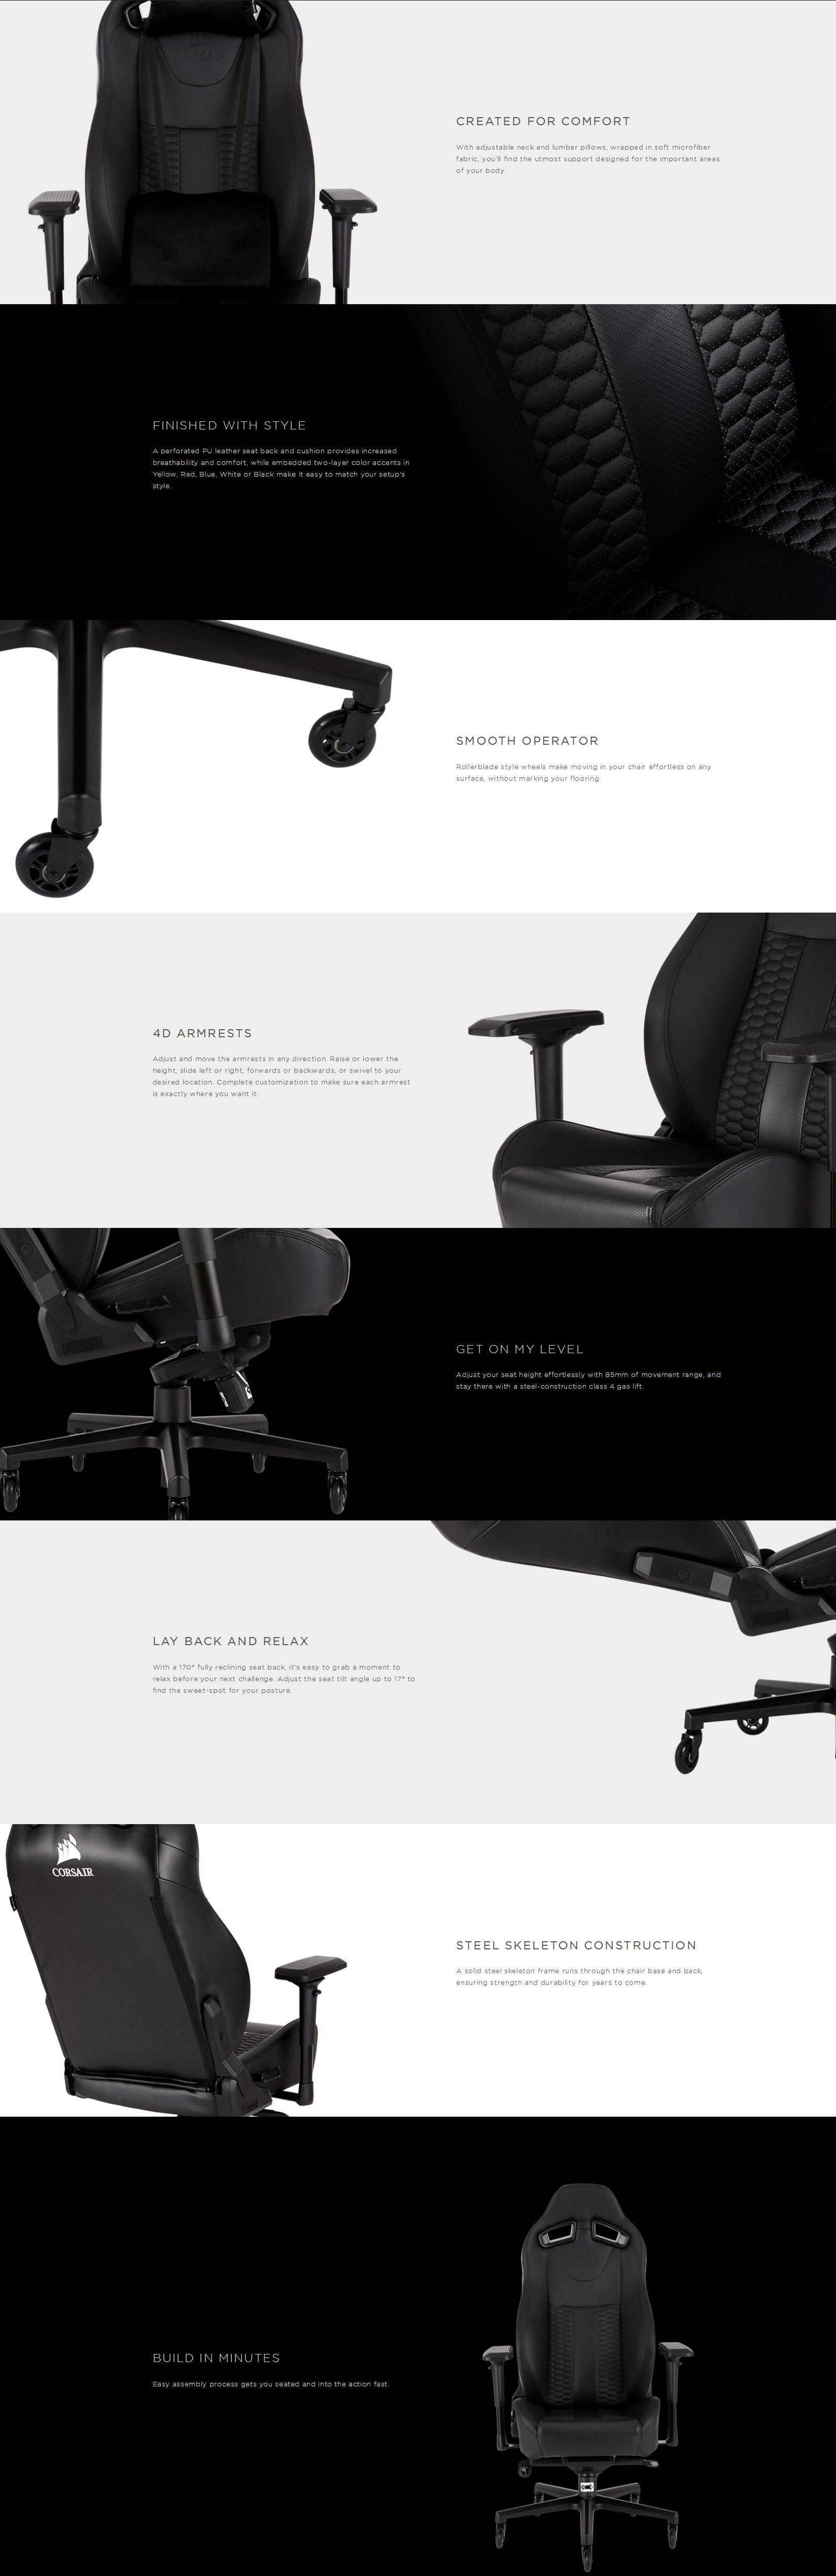 Tremendous Corsair T2 Road Warrior High Back Office Gaming Chair Black Black Camellatalisay Diy Chair Ideas Camellatalisaycom